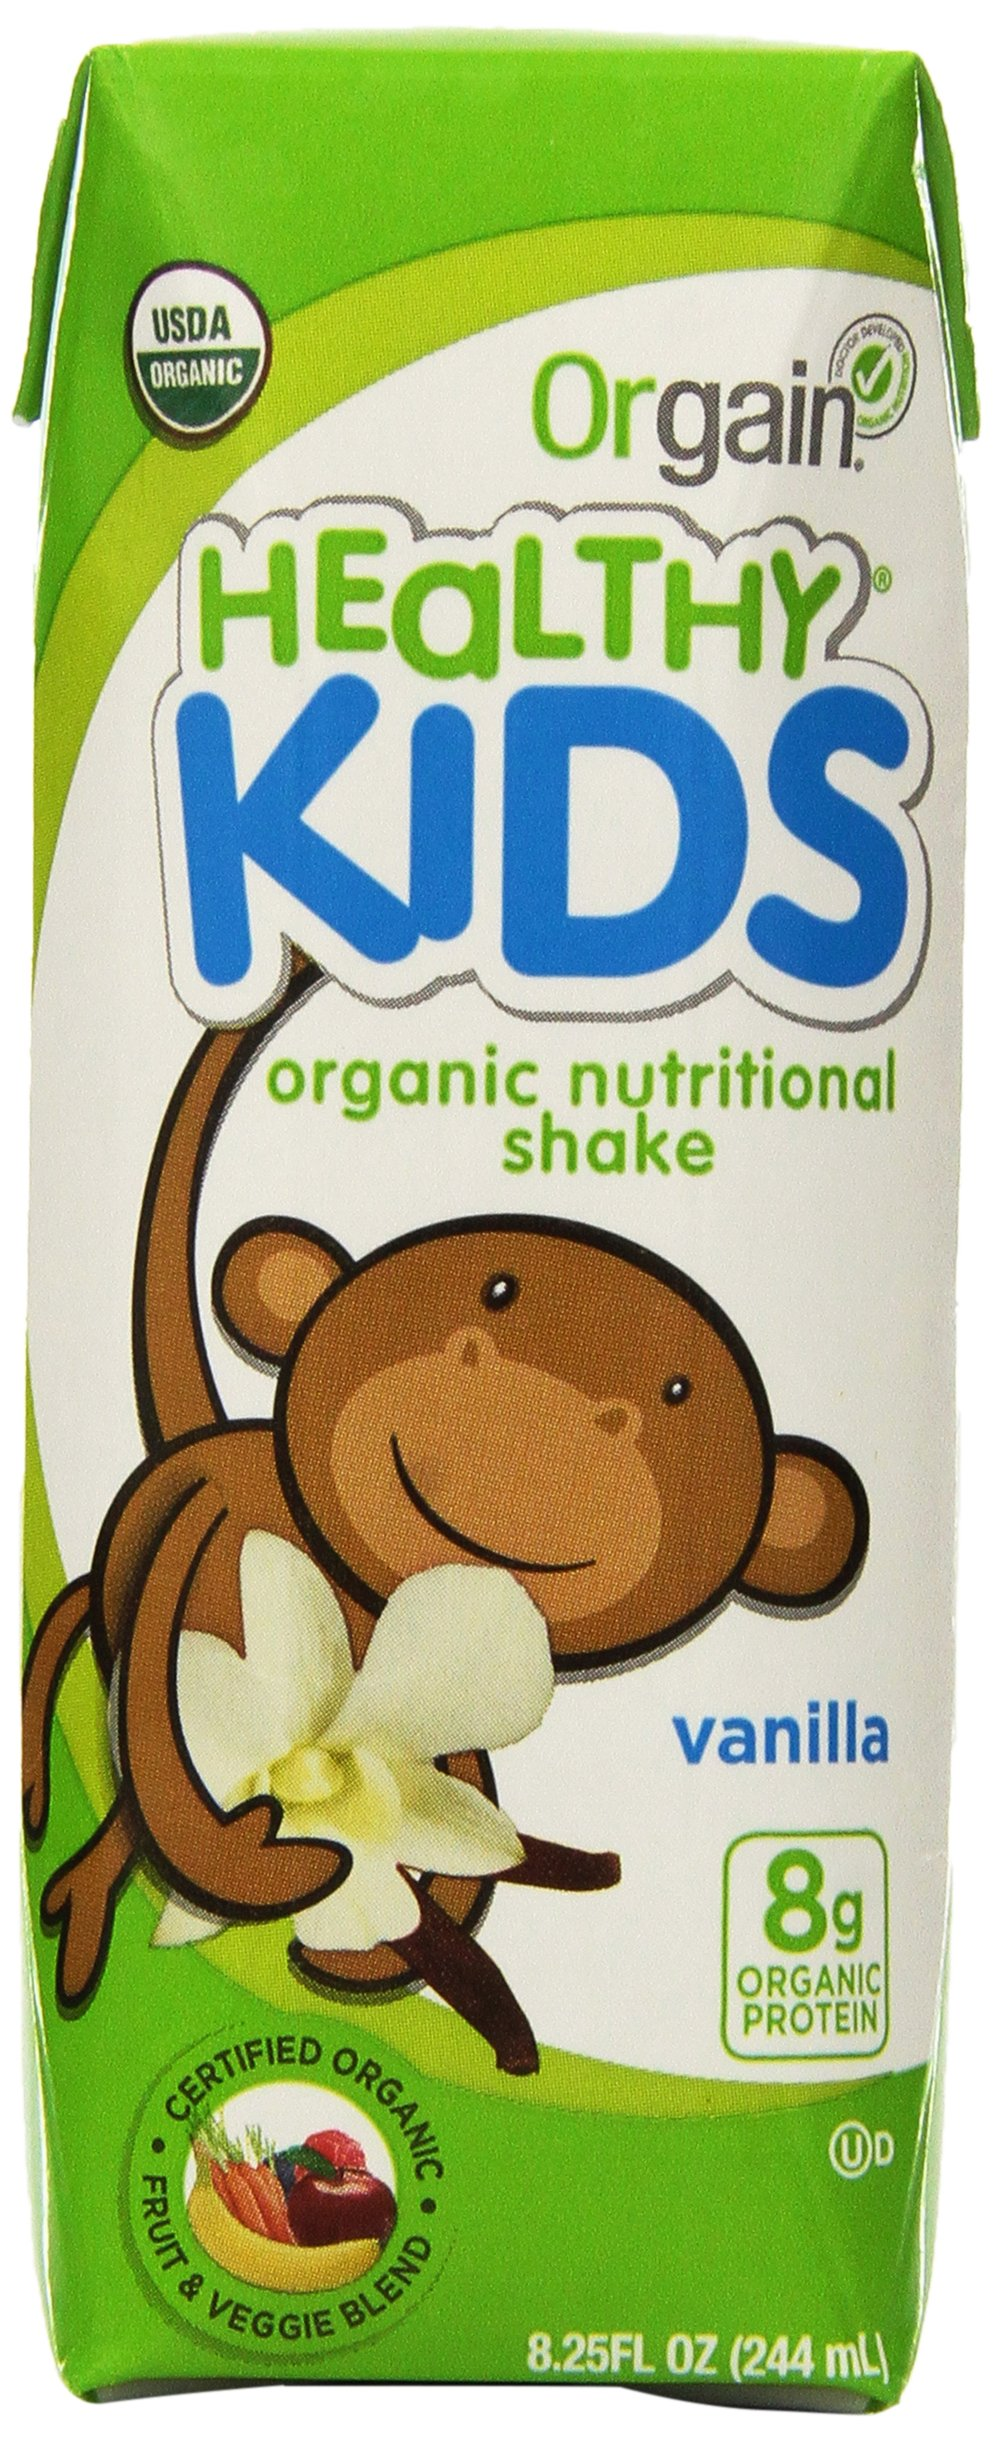 Orgain Healthy Kids Organic Nutritional Shake, Vanilla, 8.25 Fluid Ounce